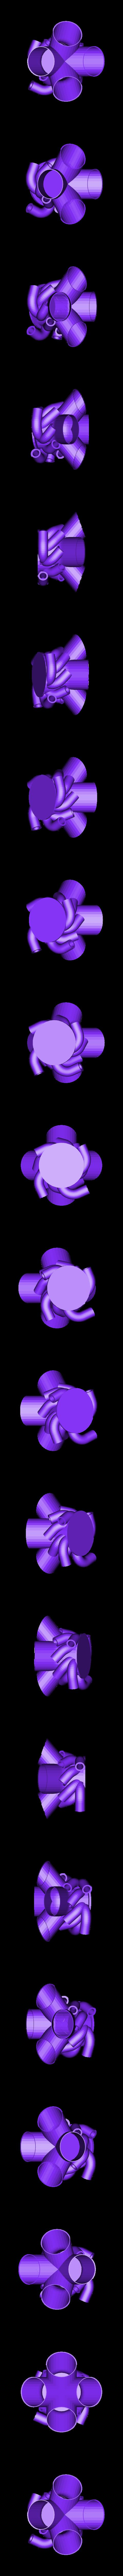 things_7.stl Download free STL file Things • 3D printer model, squiqui